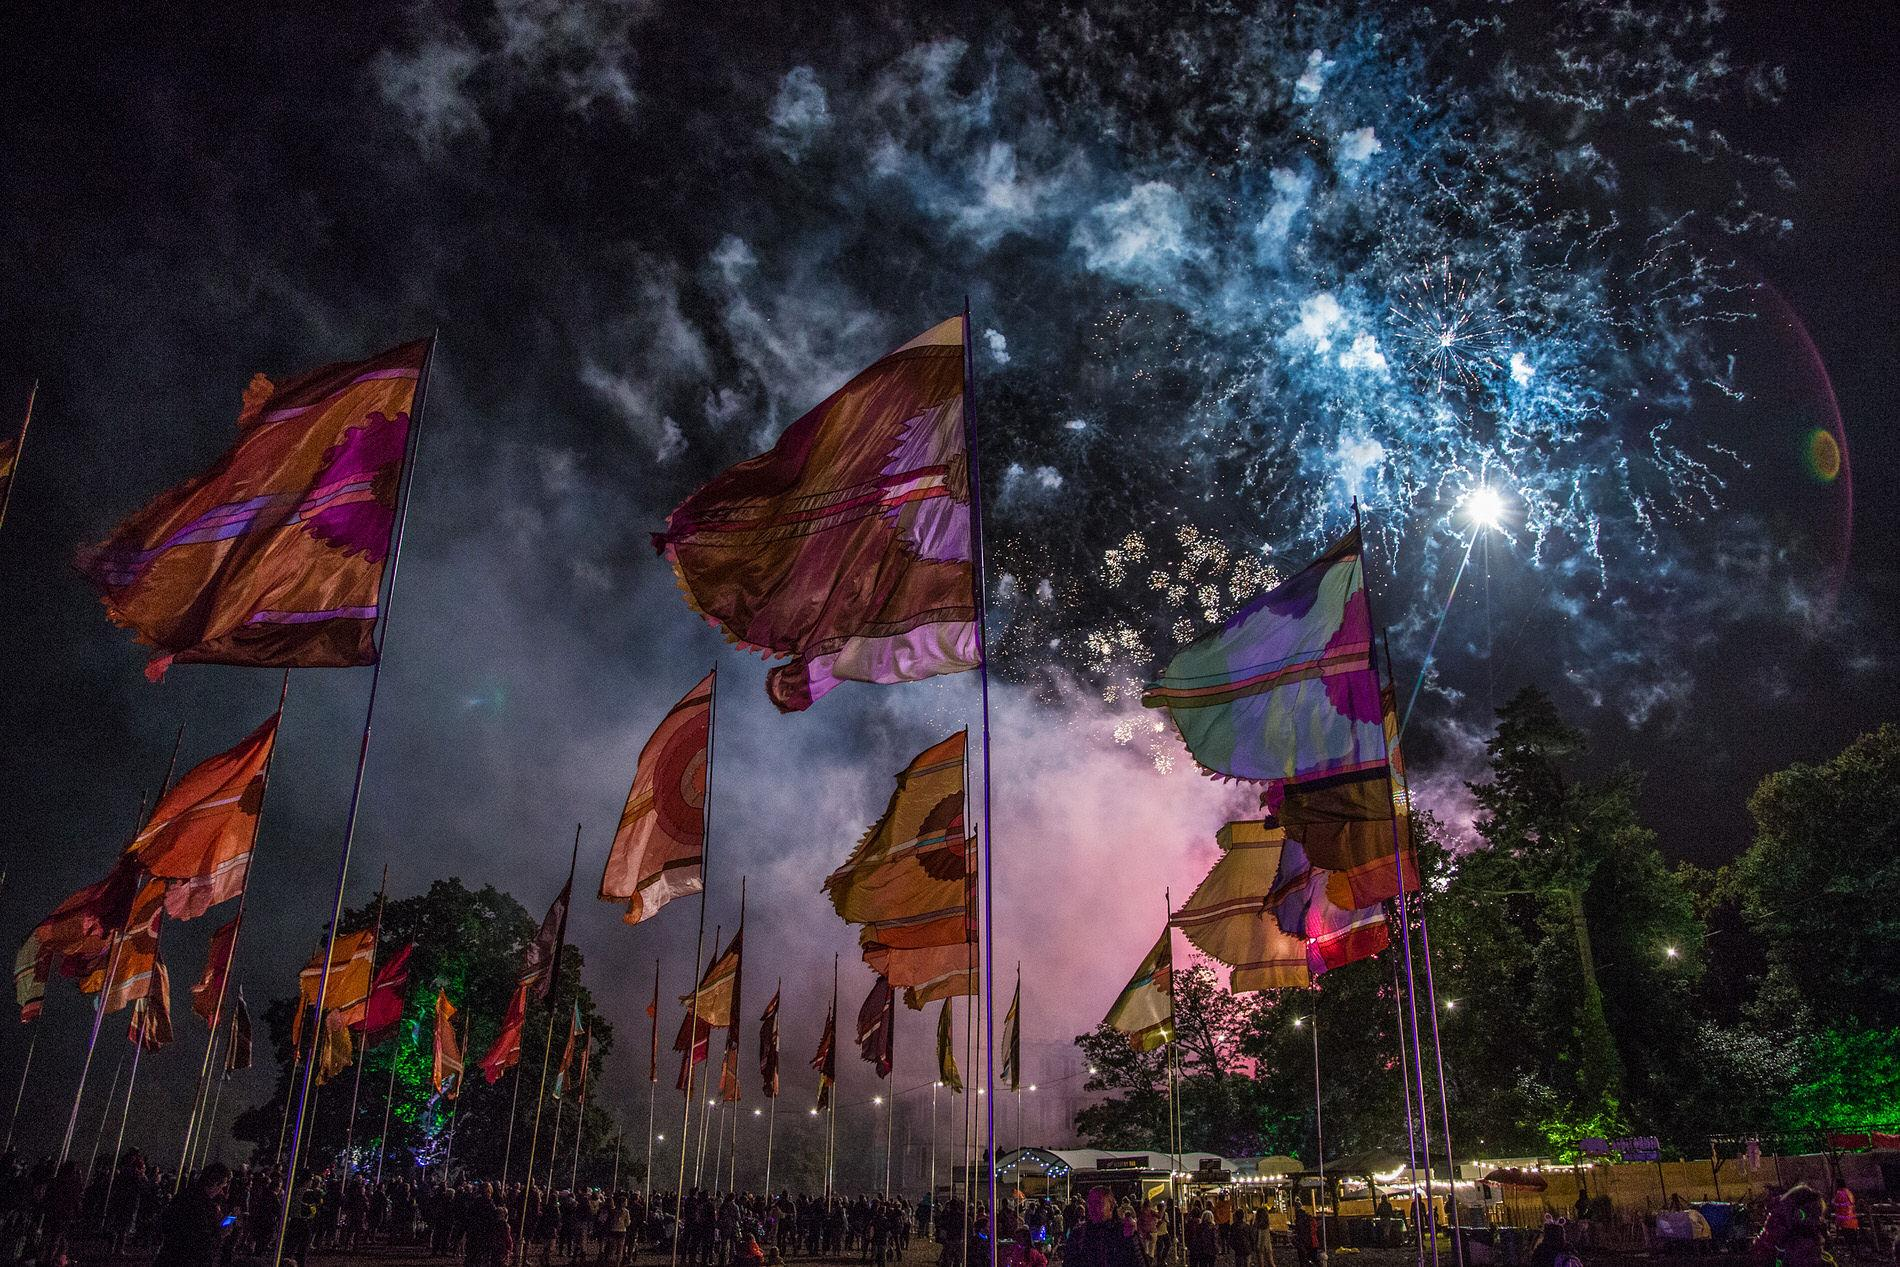 15-CampBestival2017-Fireworks-AW-ADAM4766.jpg